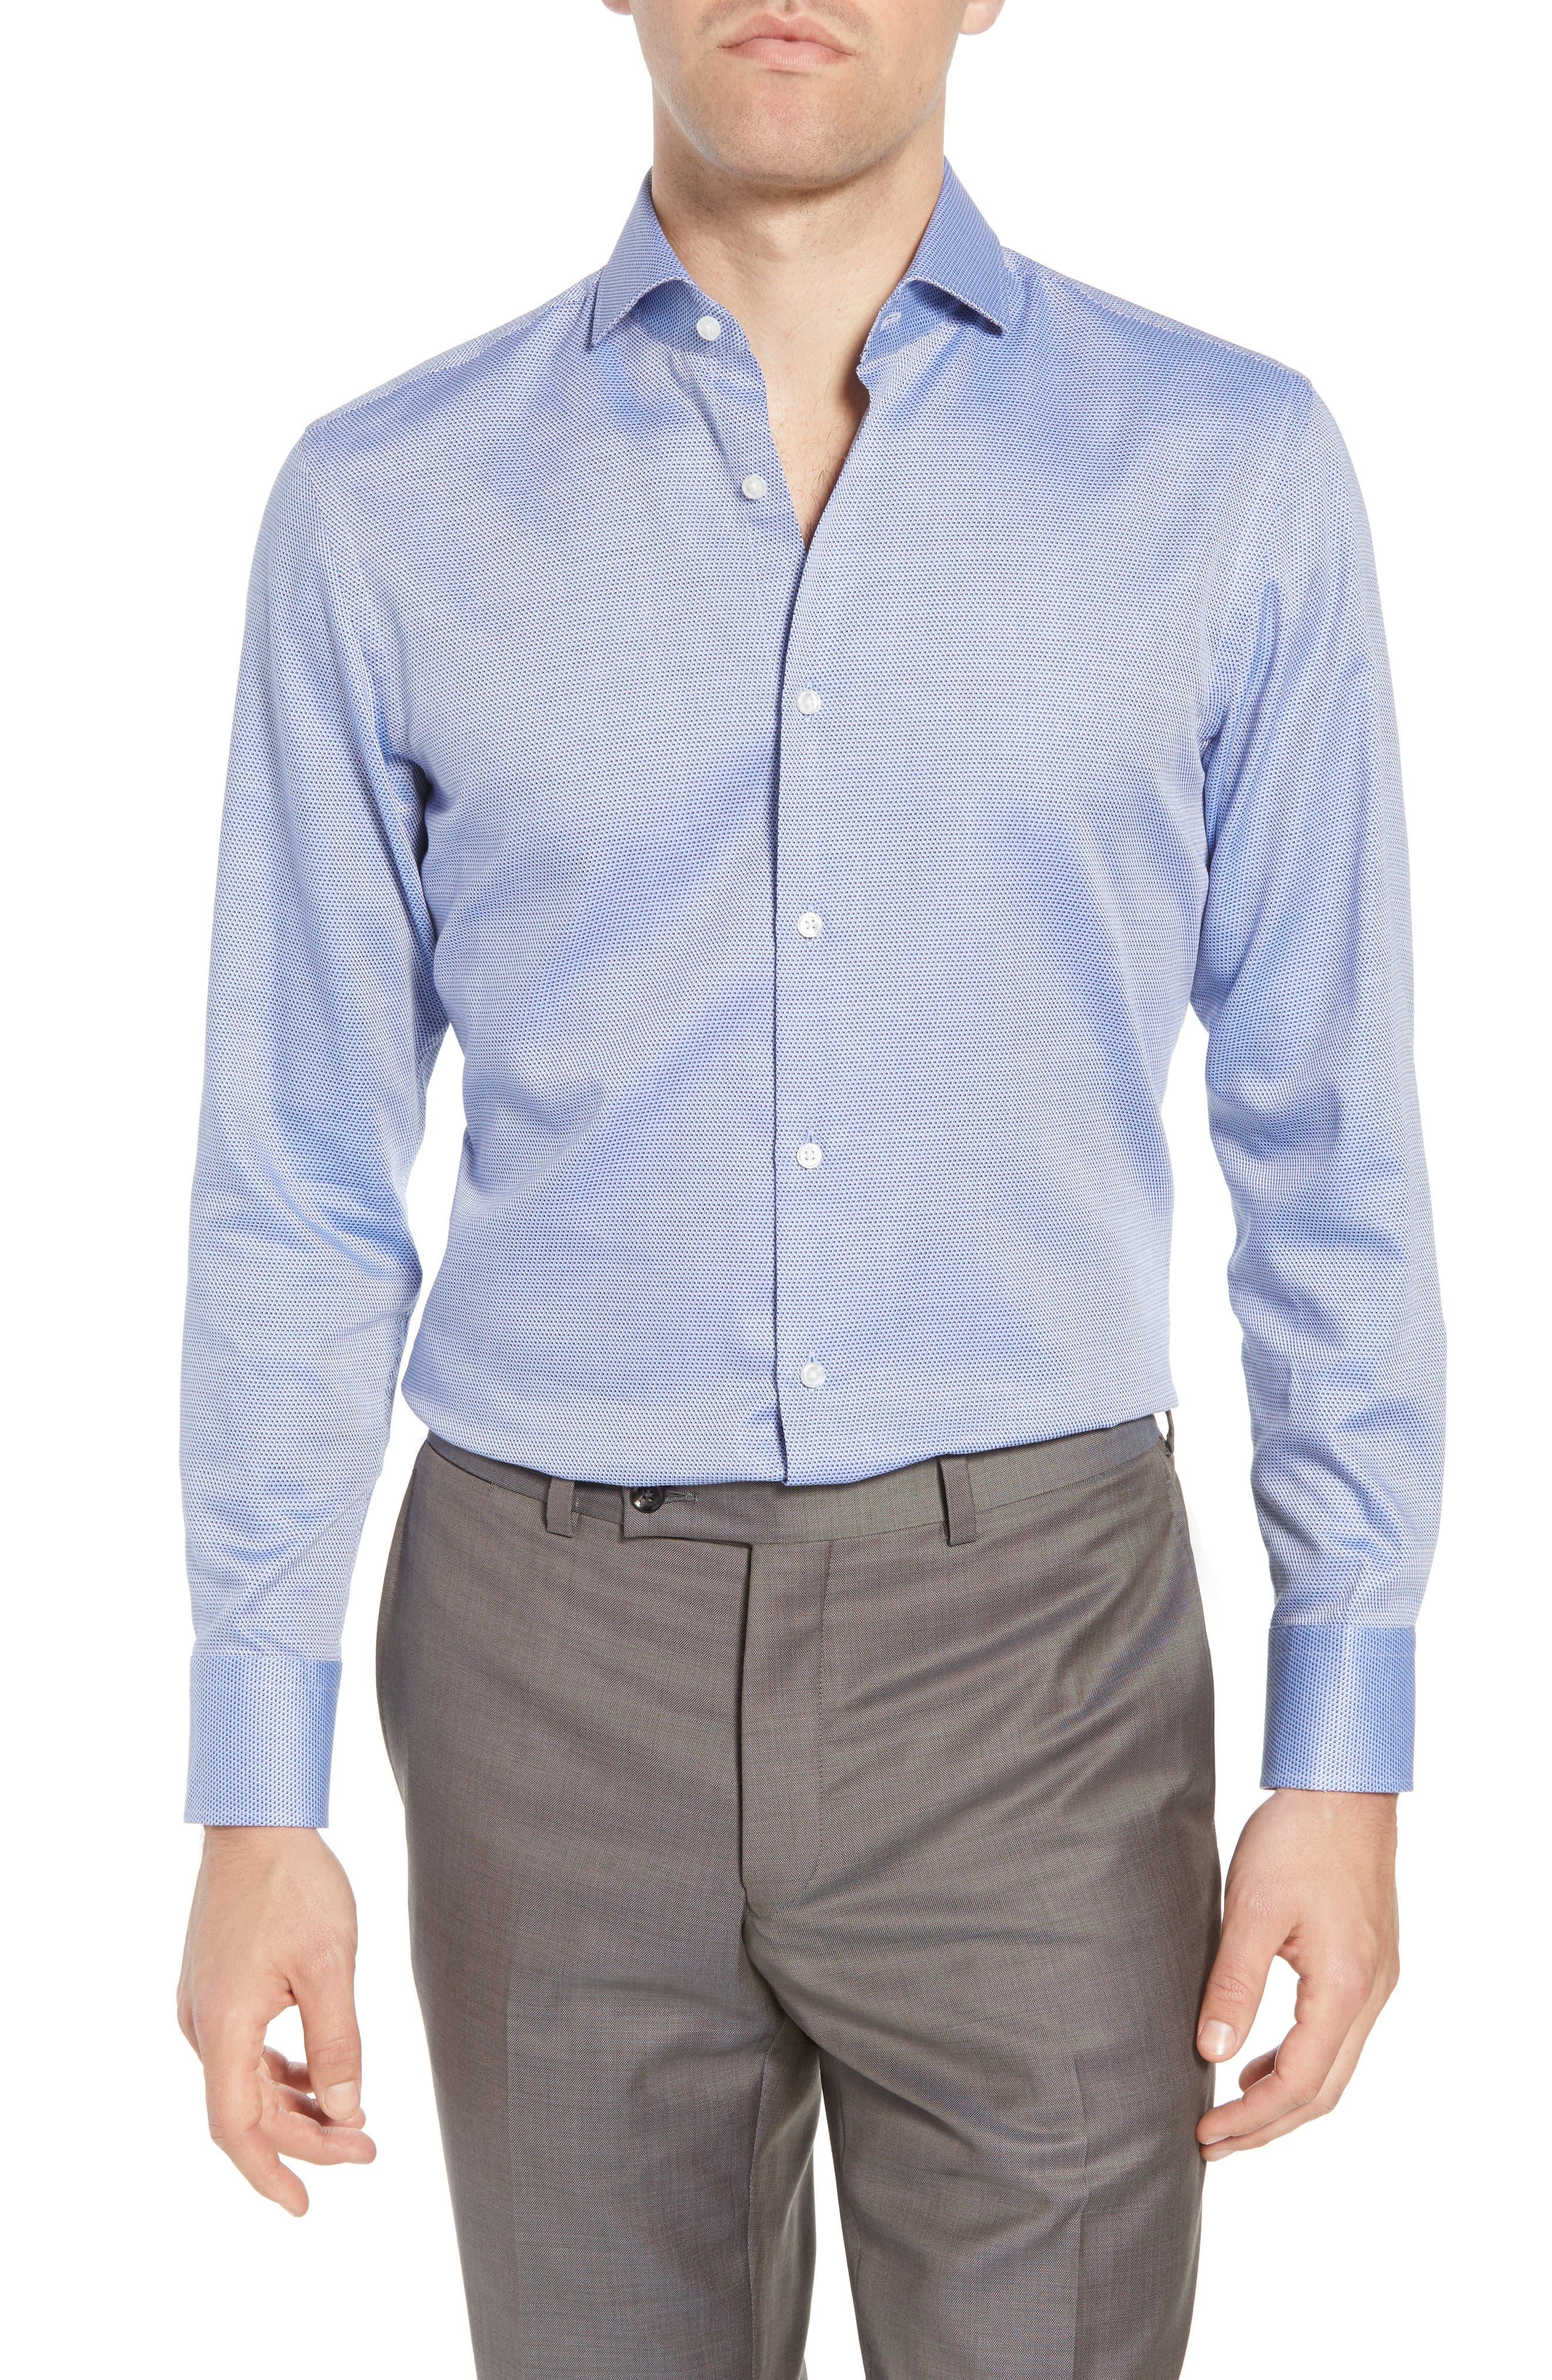 men\u0027s boss big \u0026 tall shirts nordstrom1418460 Hugo Boss Tuxedo Shirt Nordstrom #8